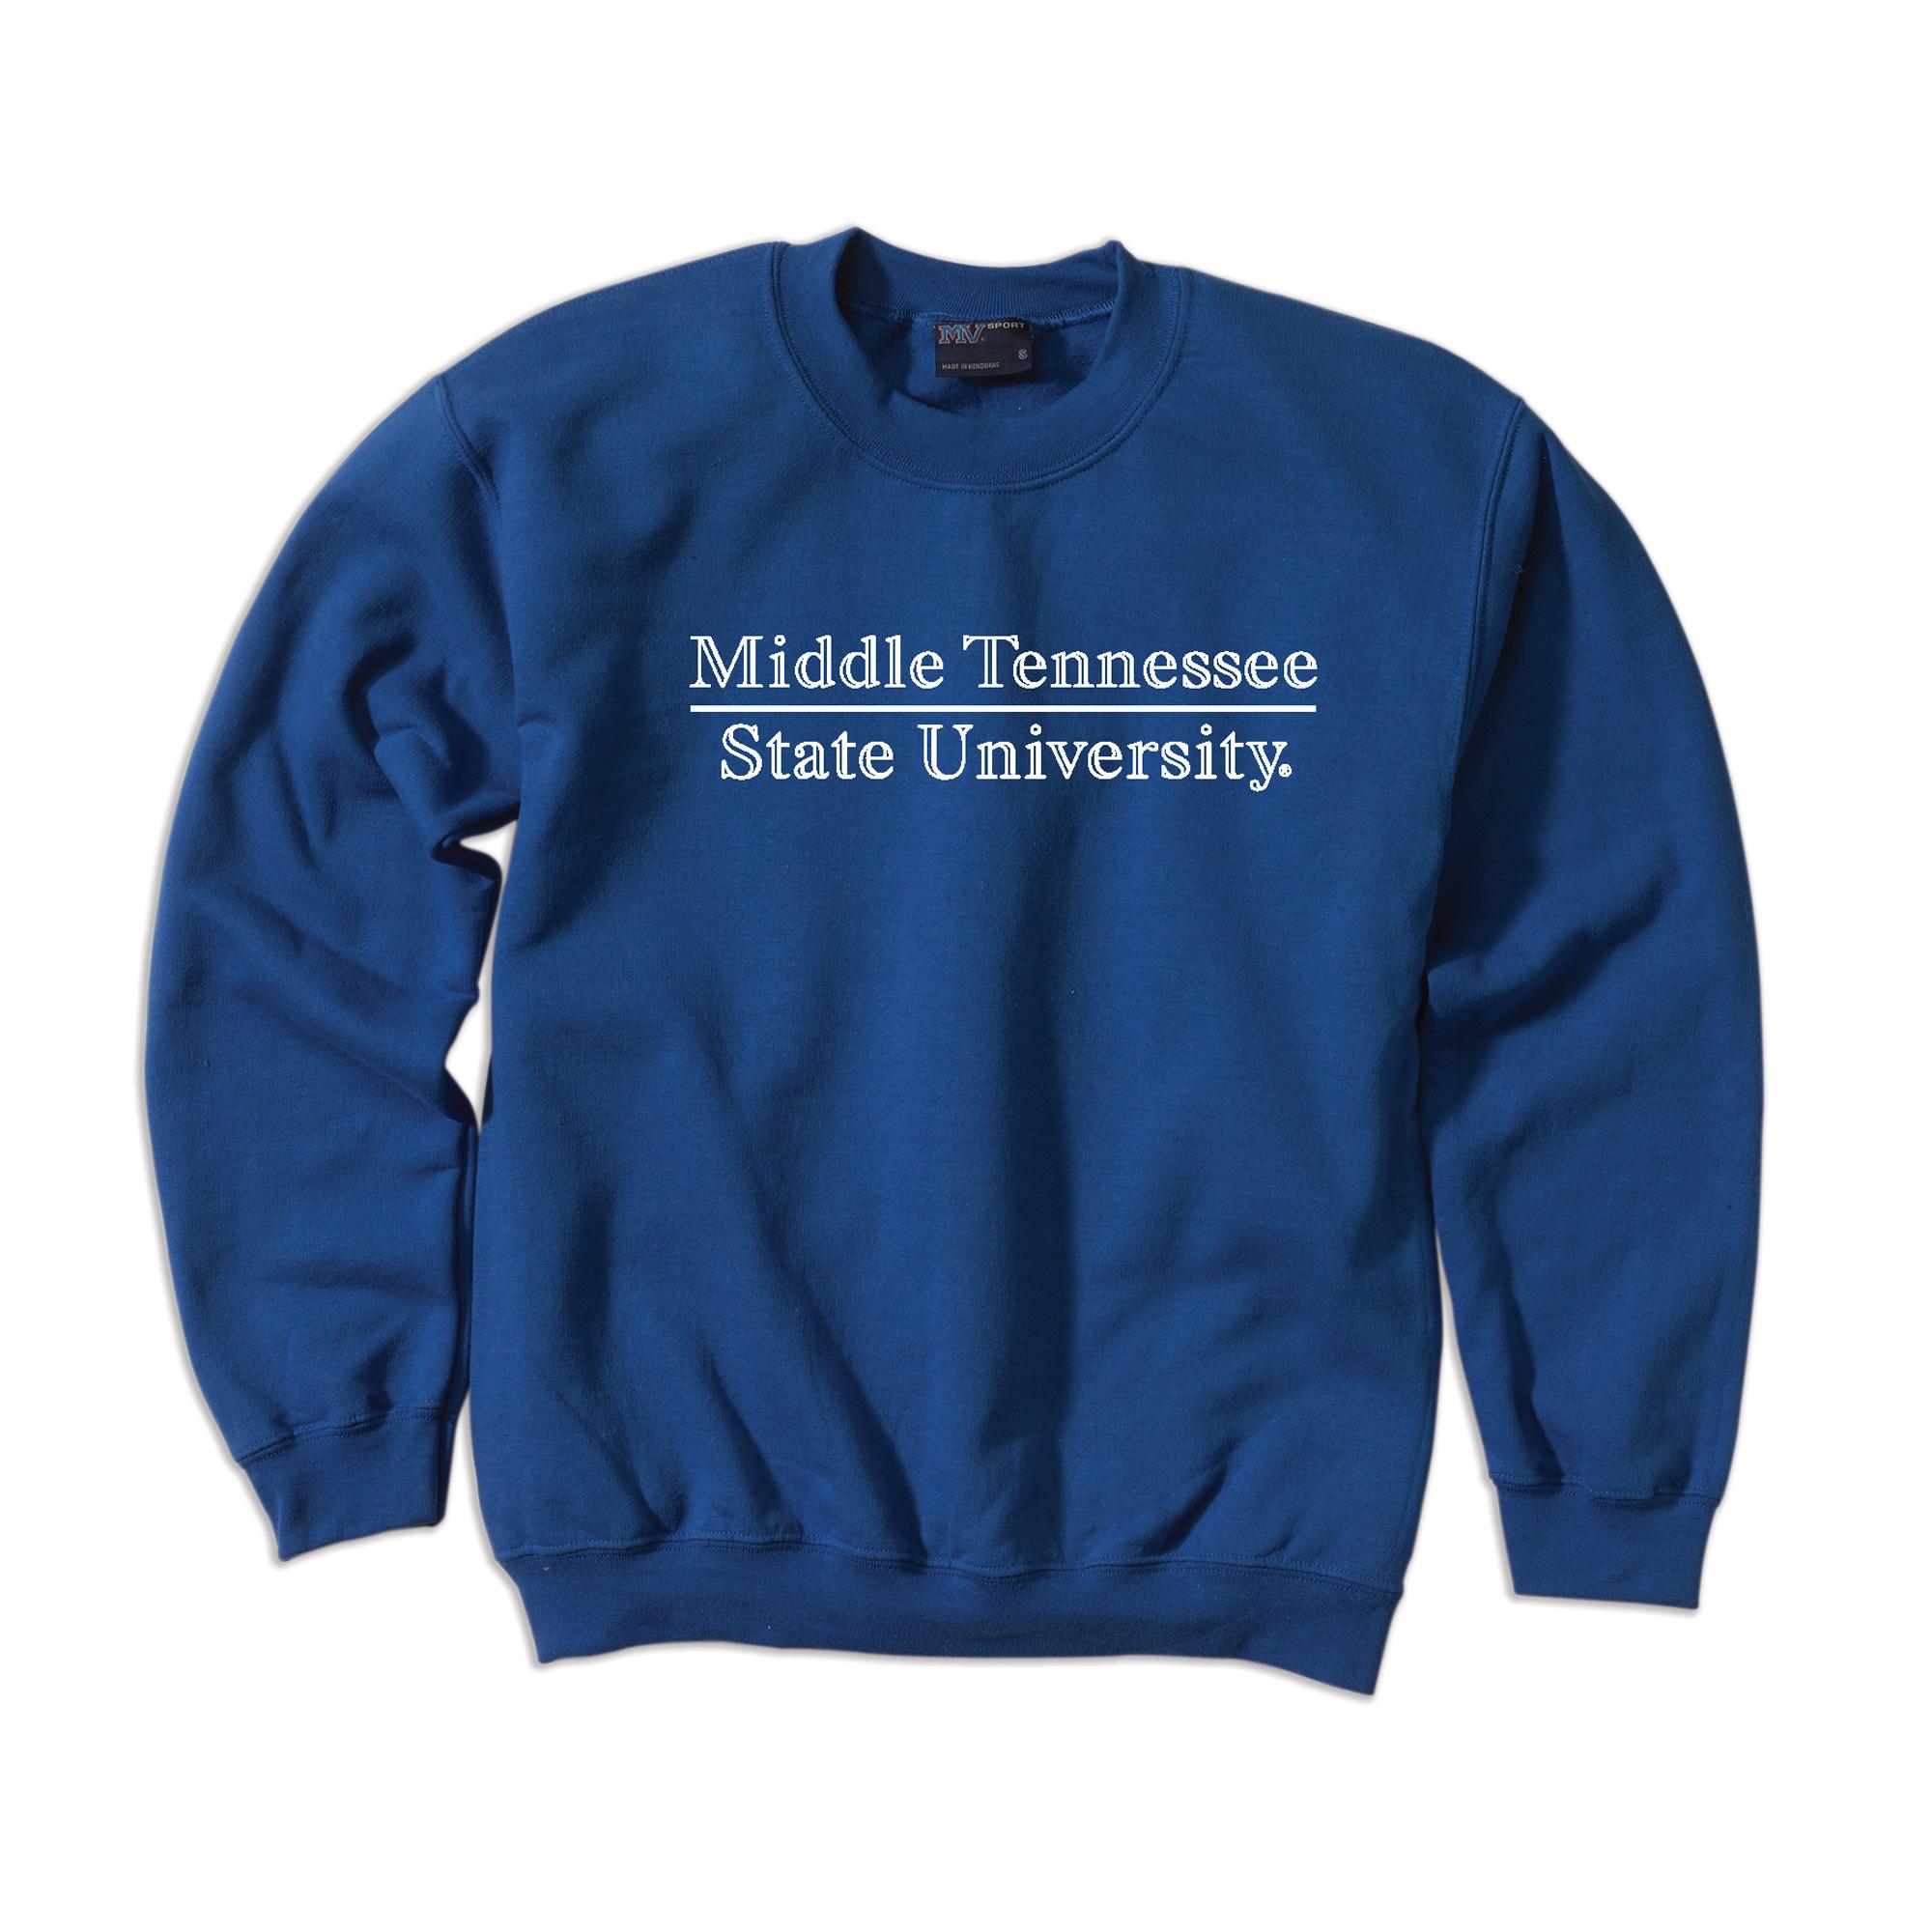 Middle Tennessee State University Comfort Fleece Sweatshirt